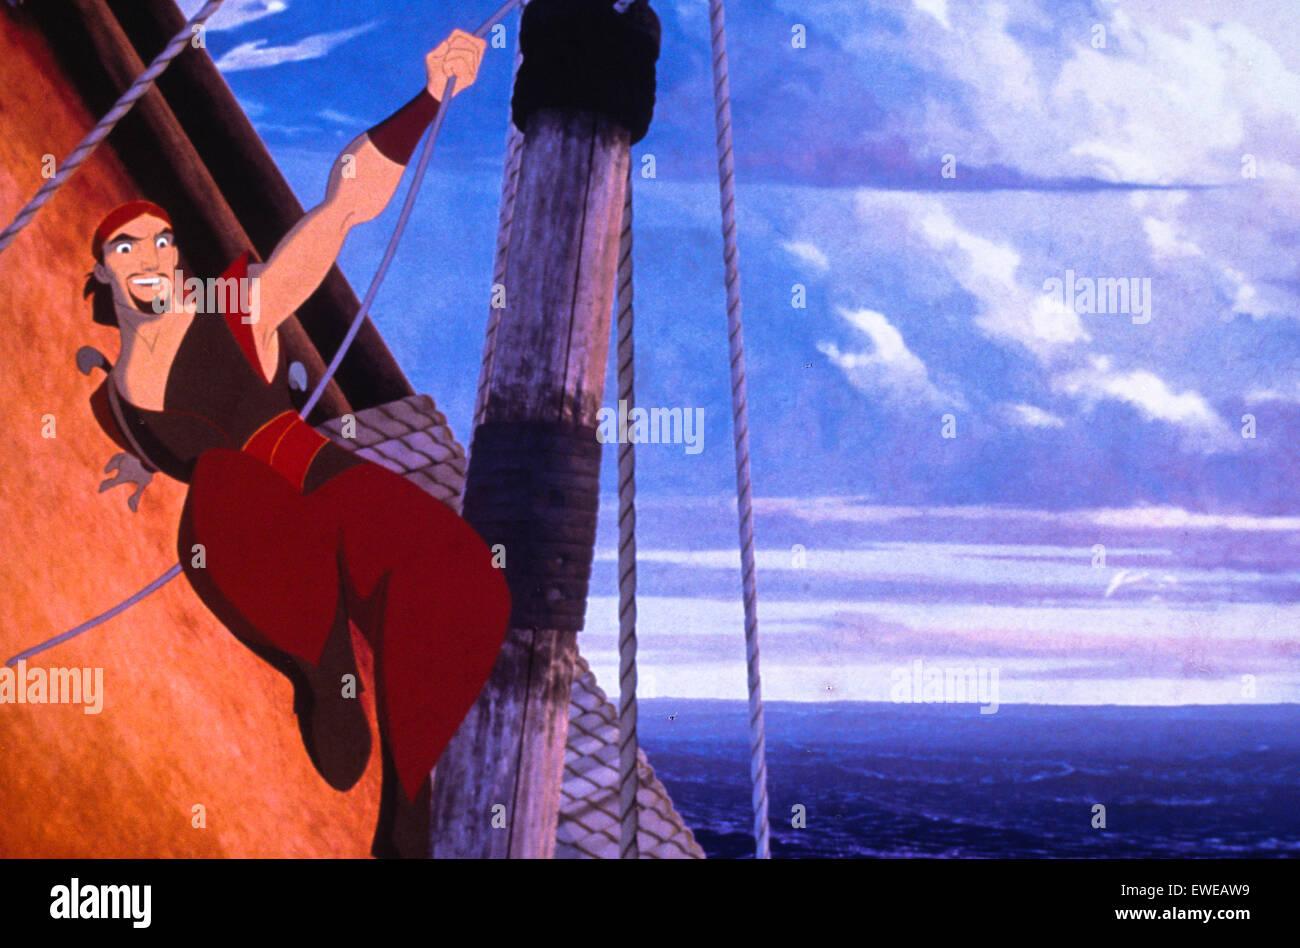 Sinbad la légende des sept mers Banque D'Images